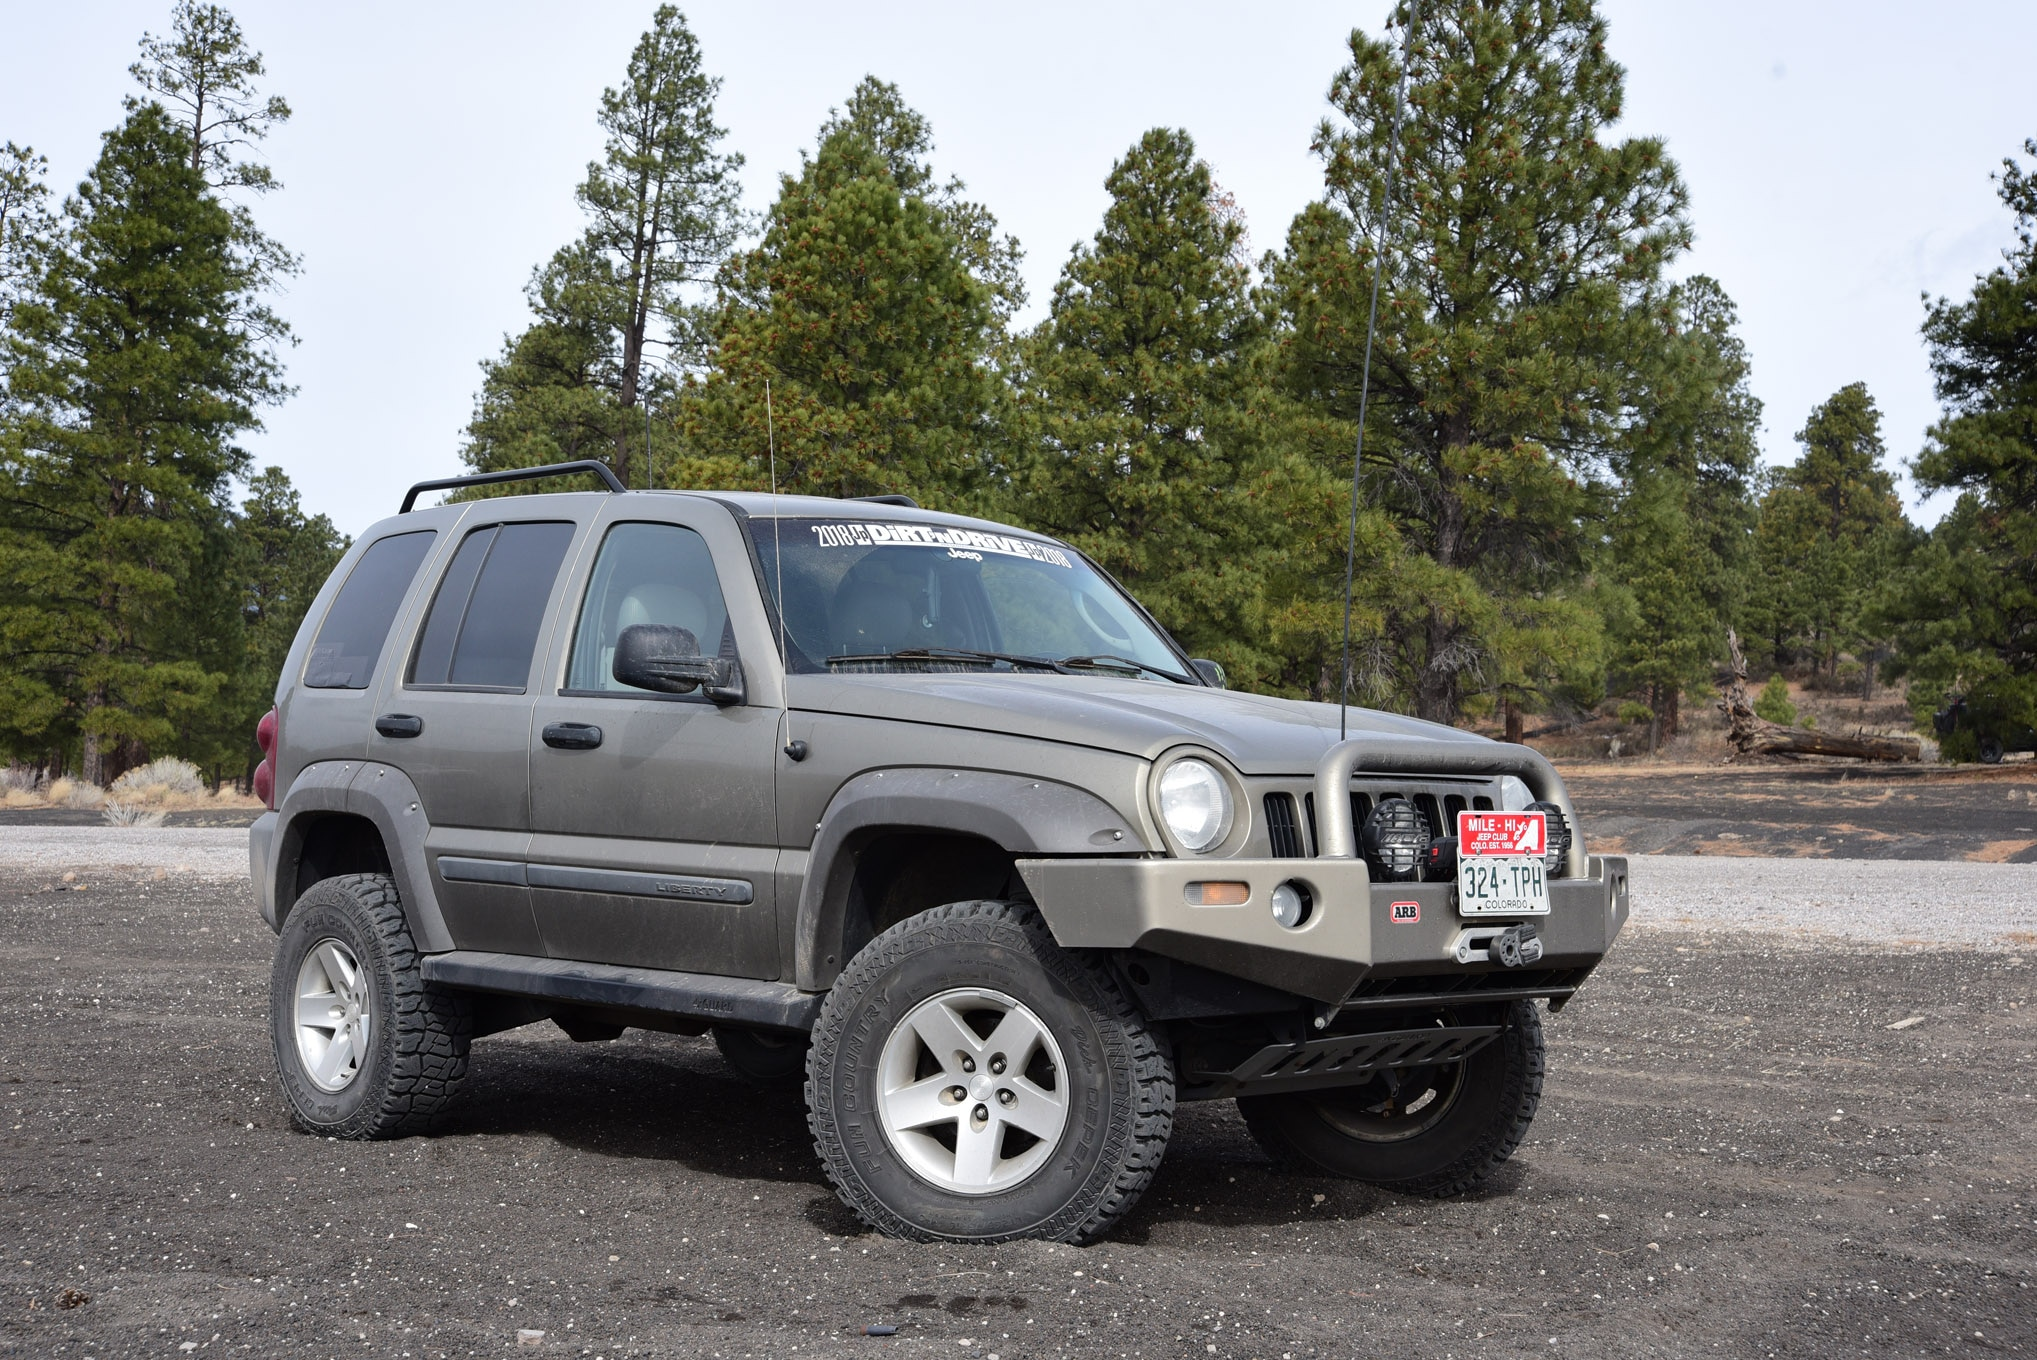 2006 Jeep KJ Liberty CRD: The 400 Pound-Foot Diesel Jeep